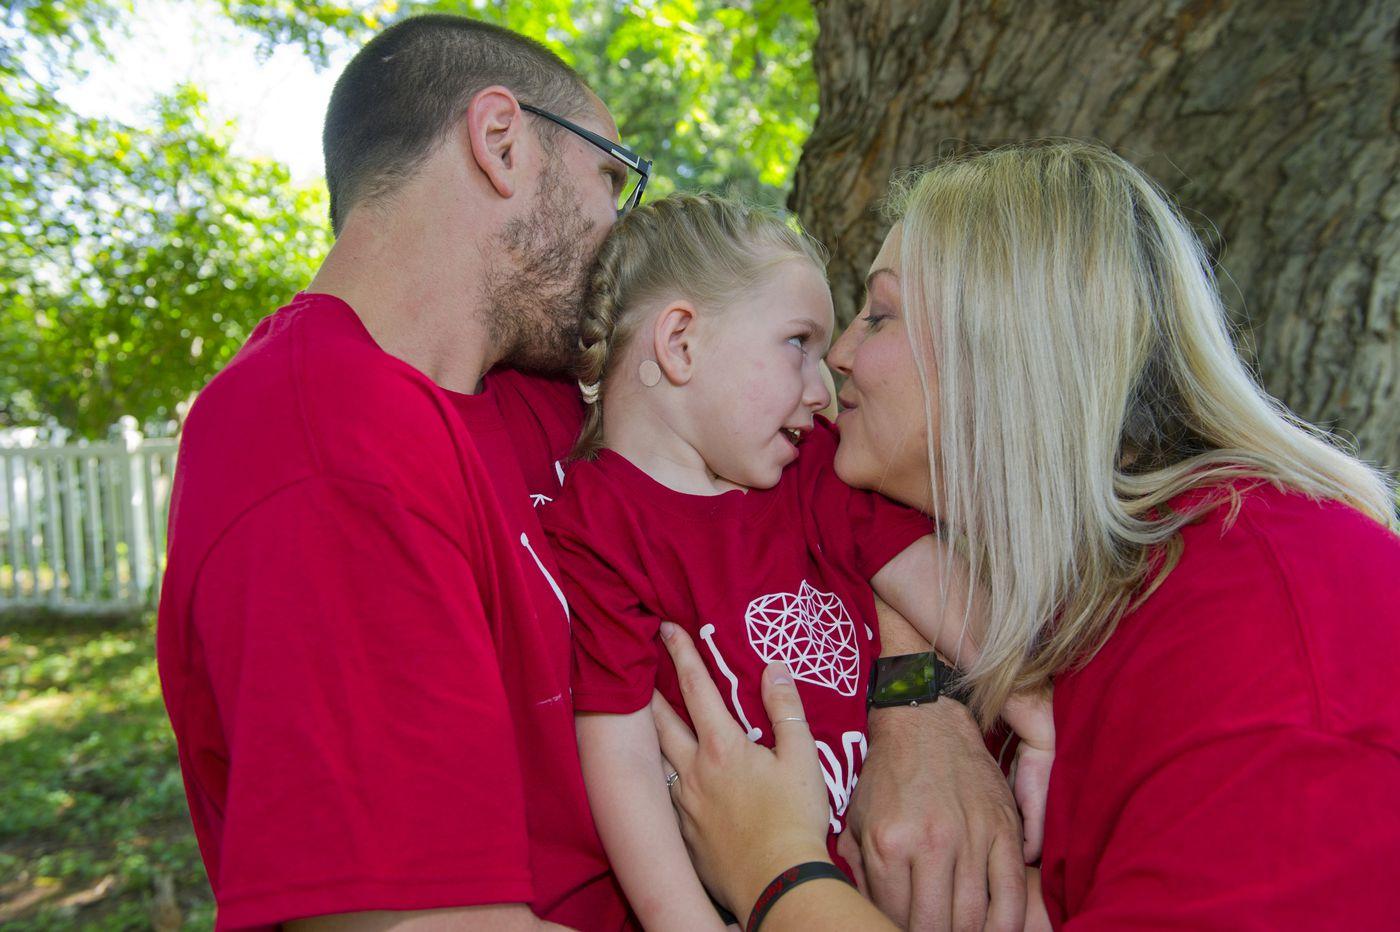 Mom's heartbreaking request: Help our sick kids save future children | Ronnie Polaneczky